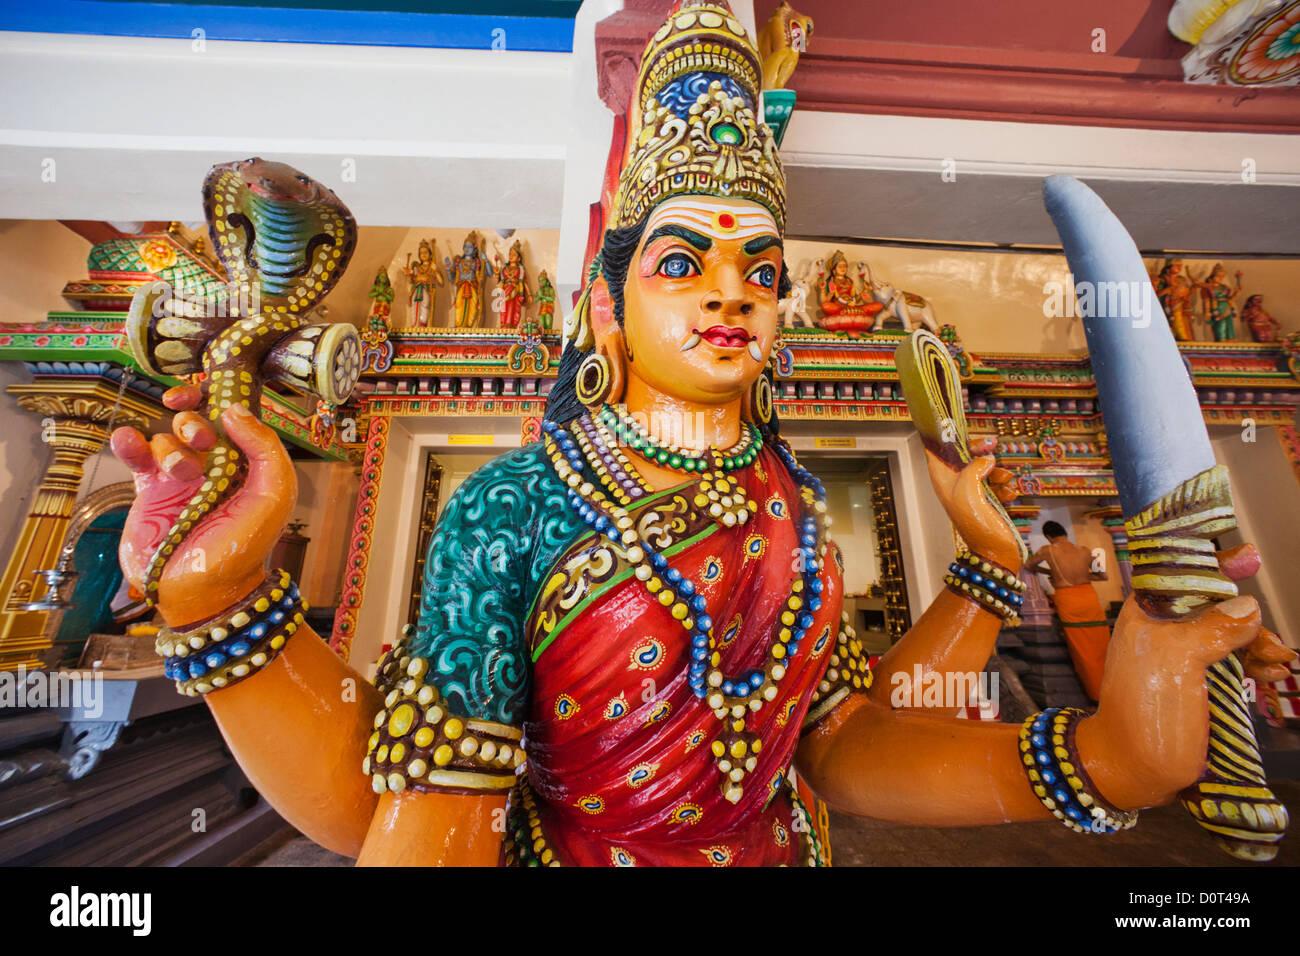 Asia, Singapore, Sri Mariamman Temple, Hindu Temple, Tamil